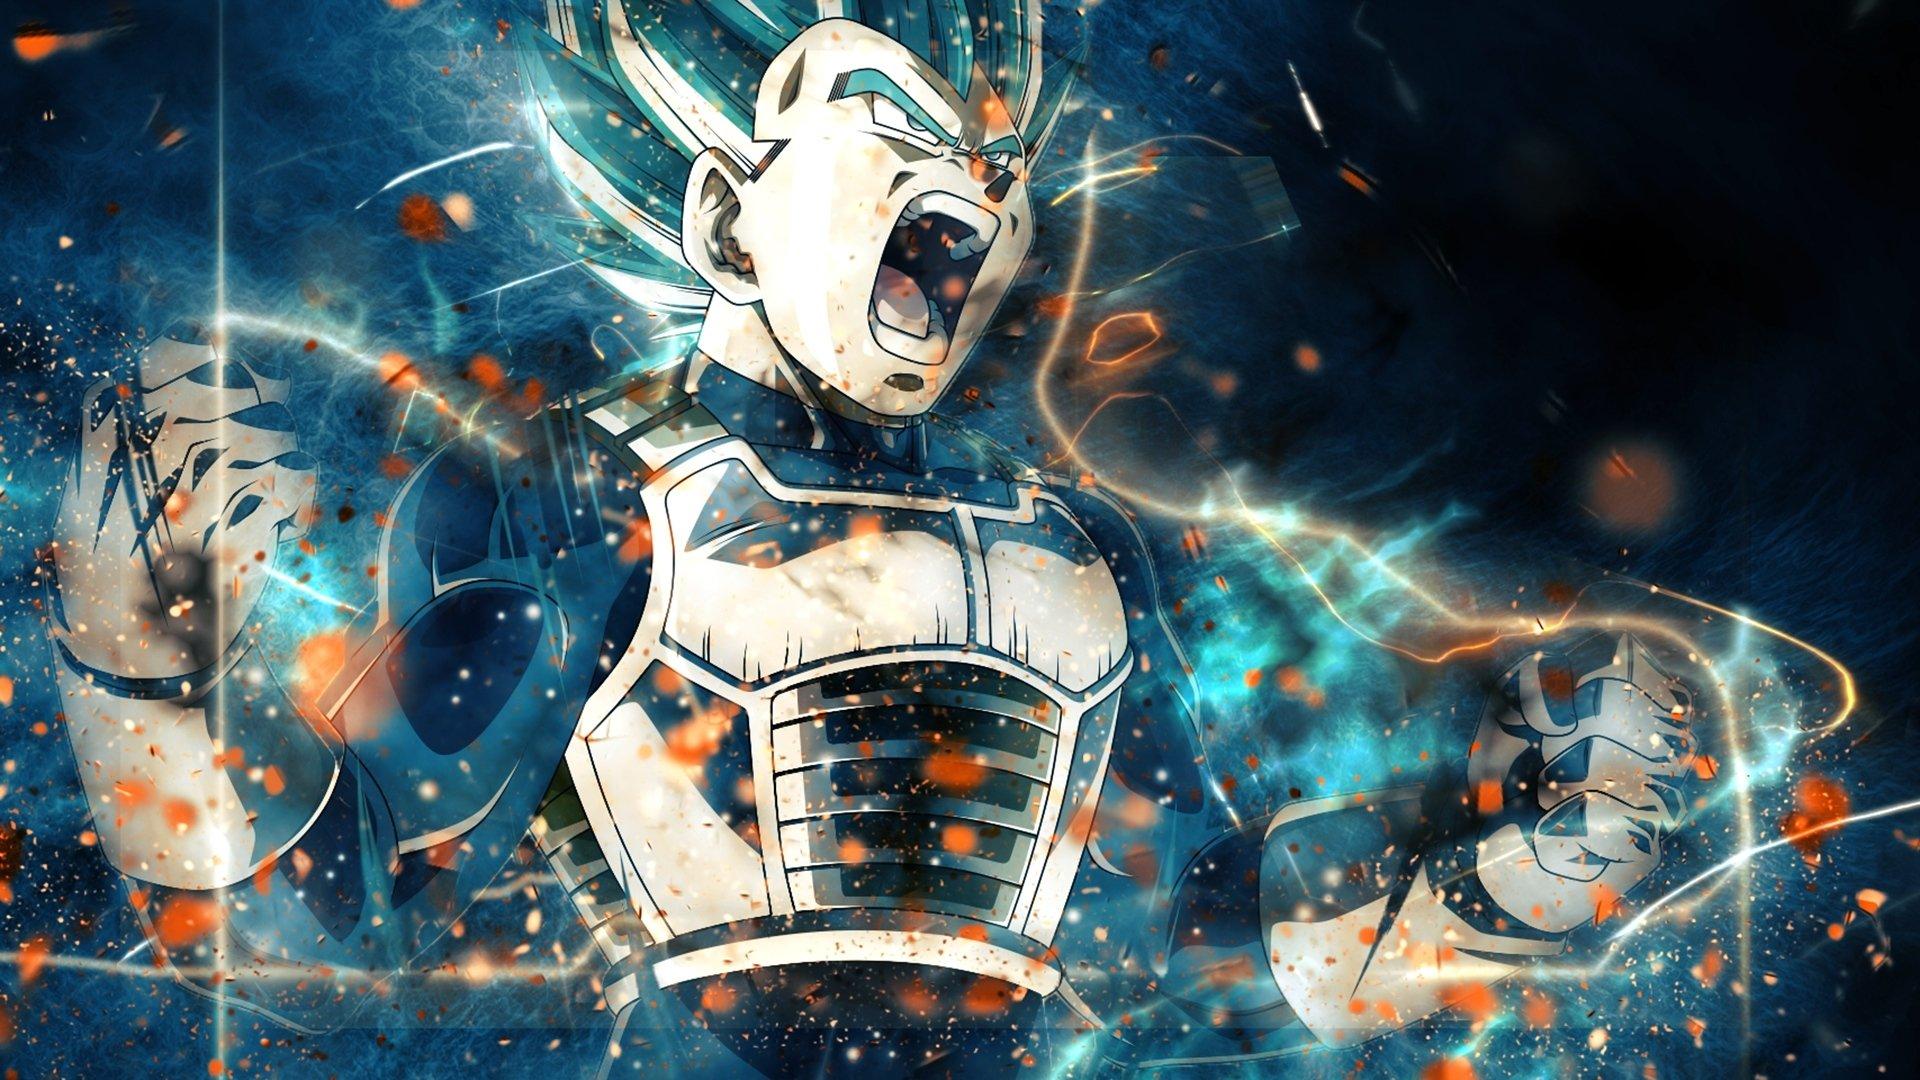 Dragon Ball Super Vegeta Hd Wallpaper Hintergrund